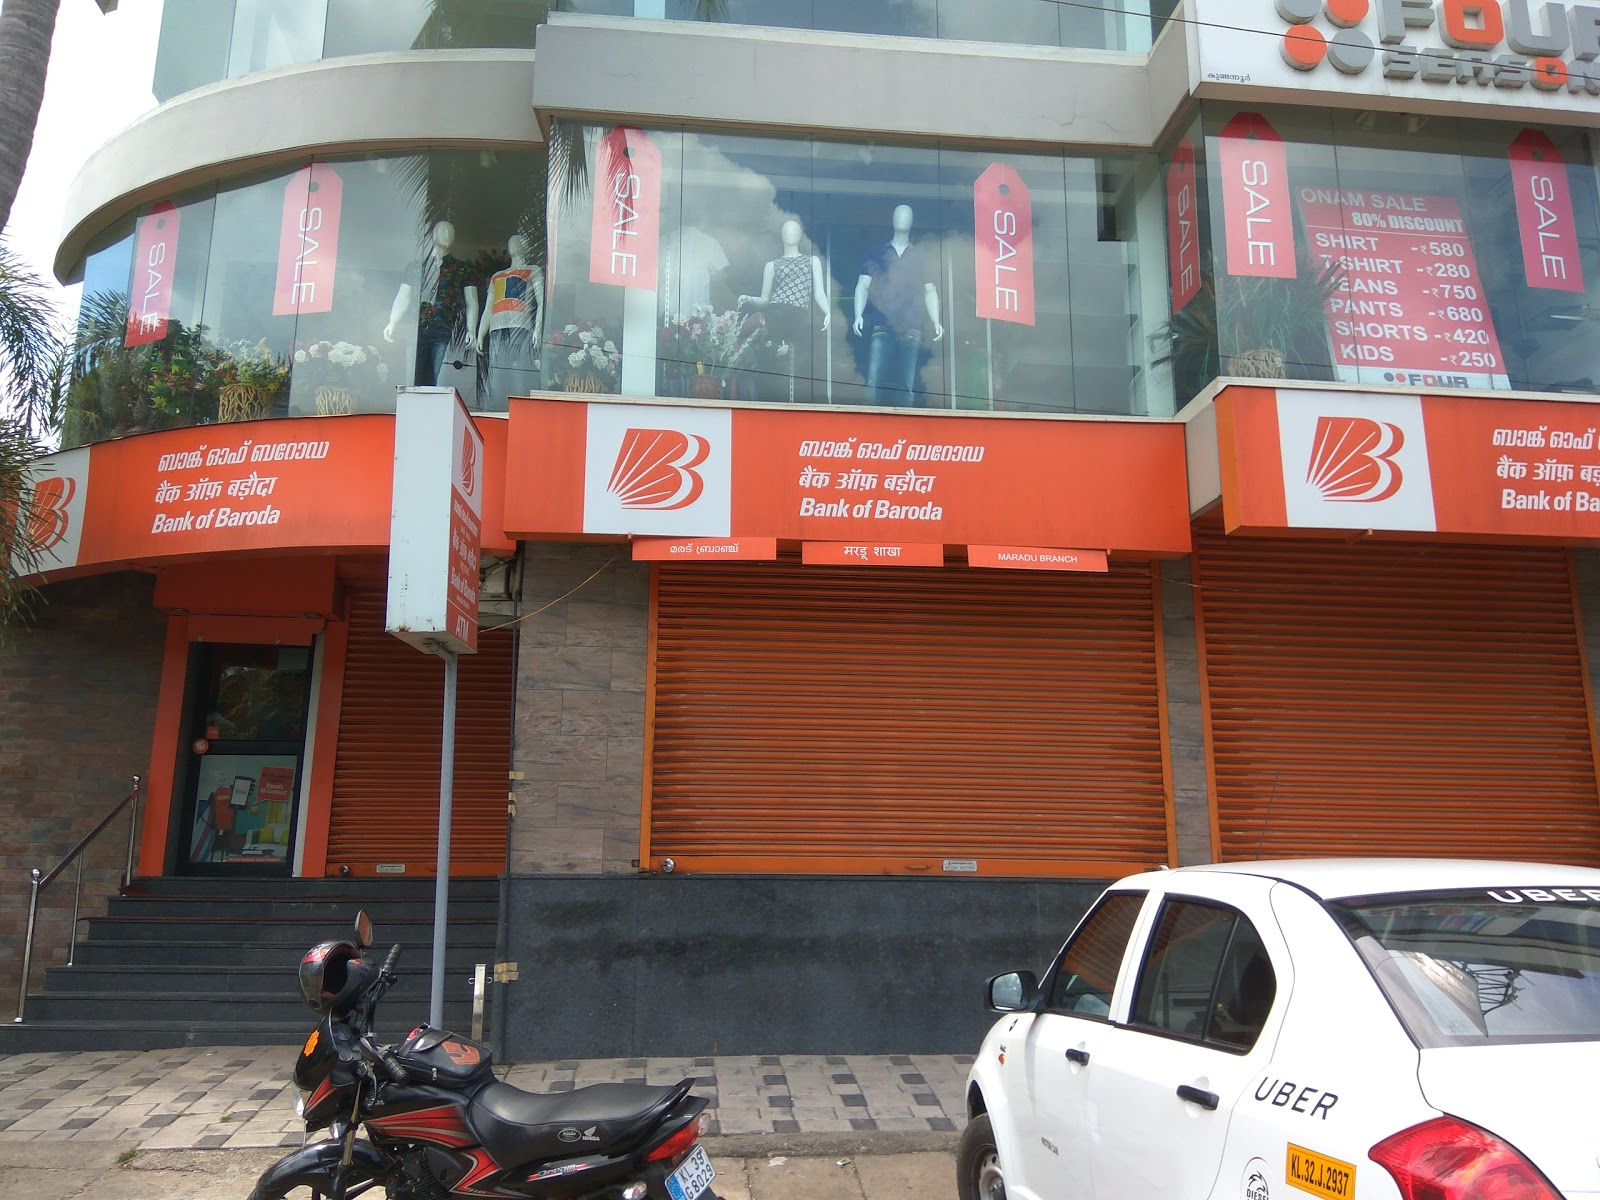 blood bank Bank Of Baroda near Ernakulam Kerala